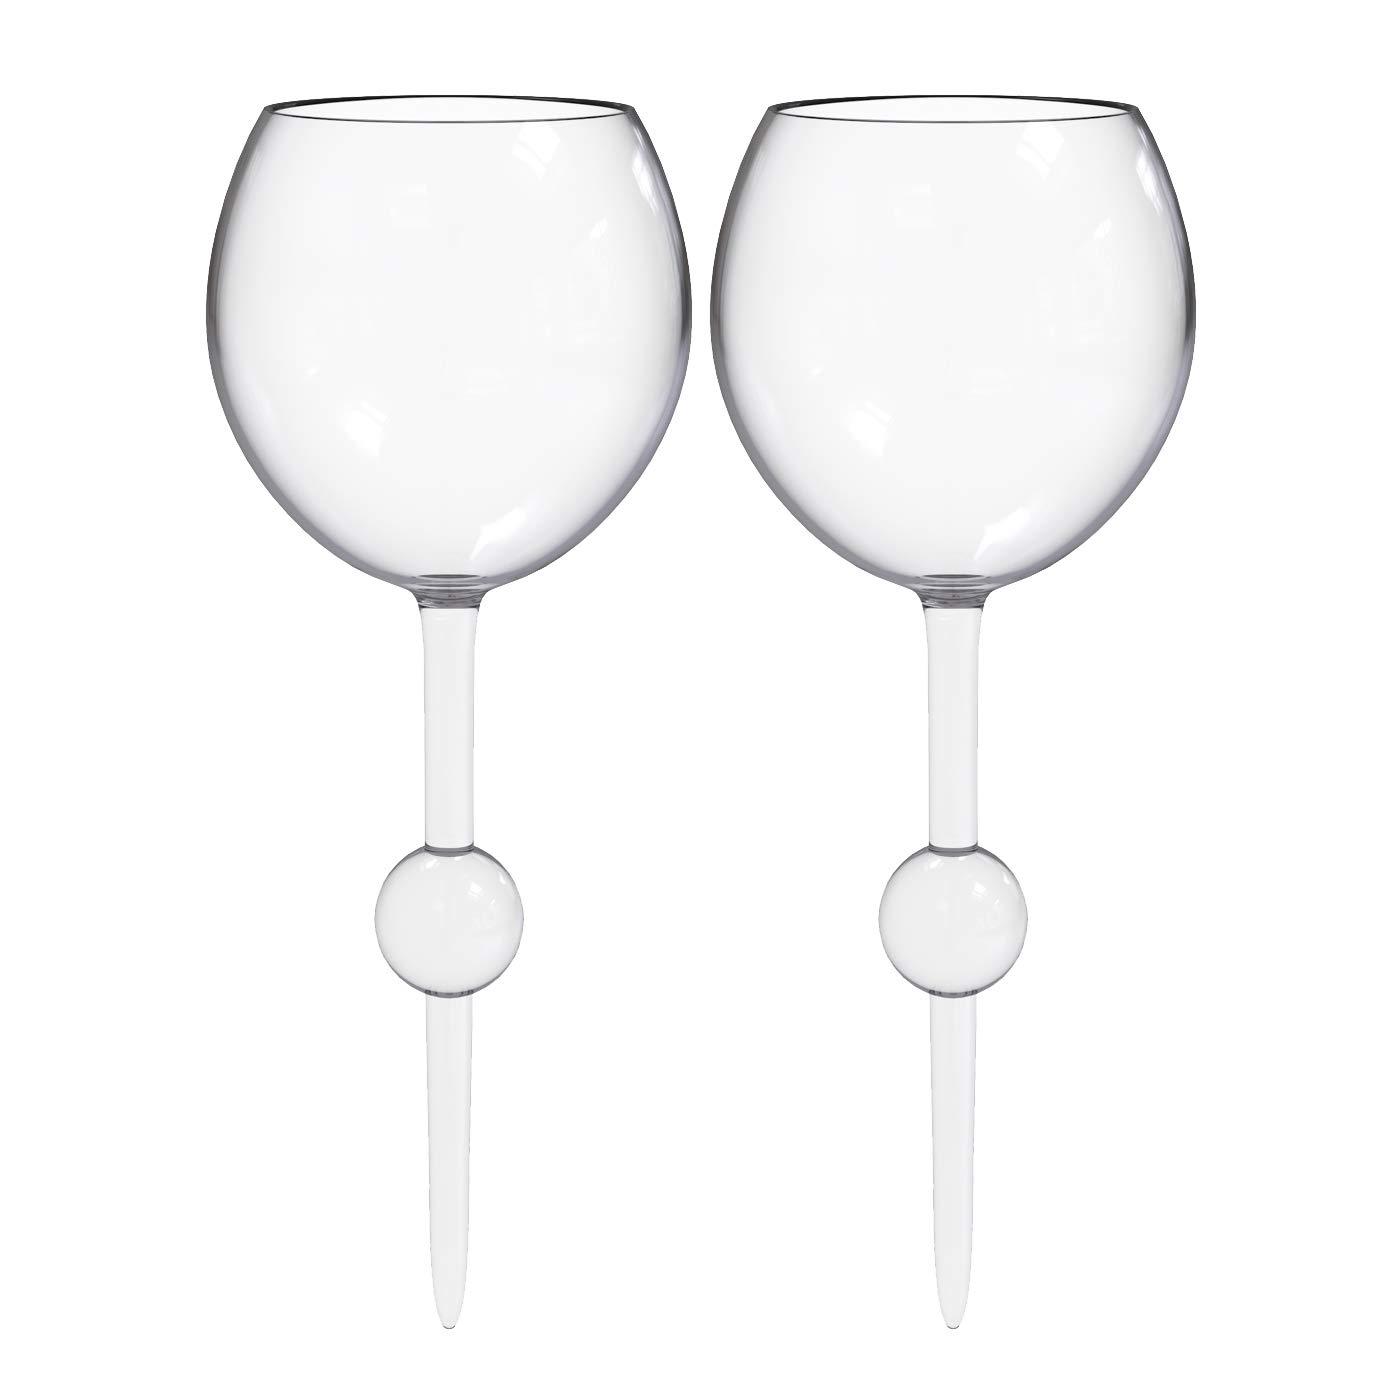 The Beach Glass Acrylic Classic Break-Resistent Seamless Floating Acrylic Wine Glass for Pool, Beach, Park 12-ounce (Crystal Clear, 2 pack)